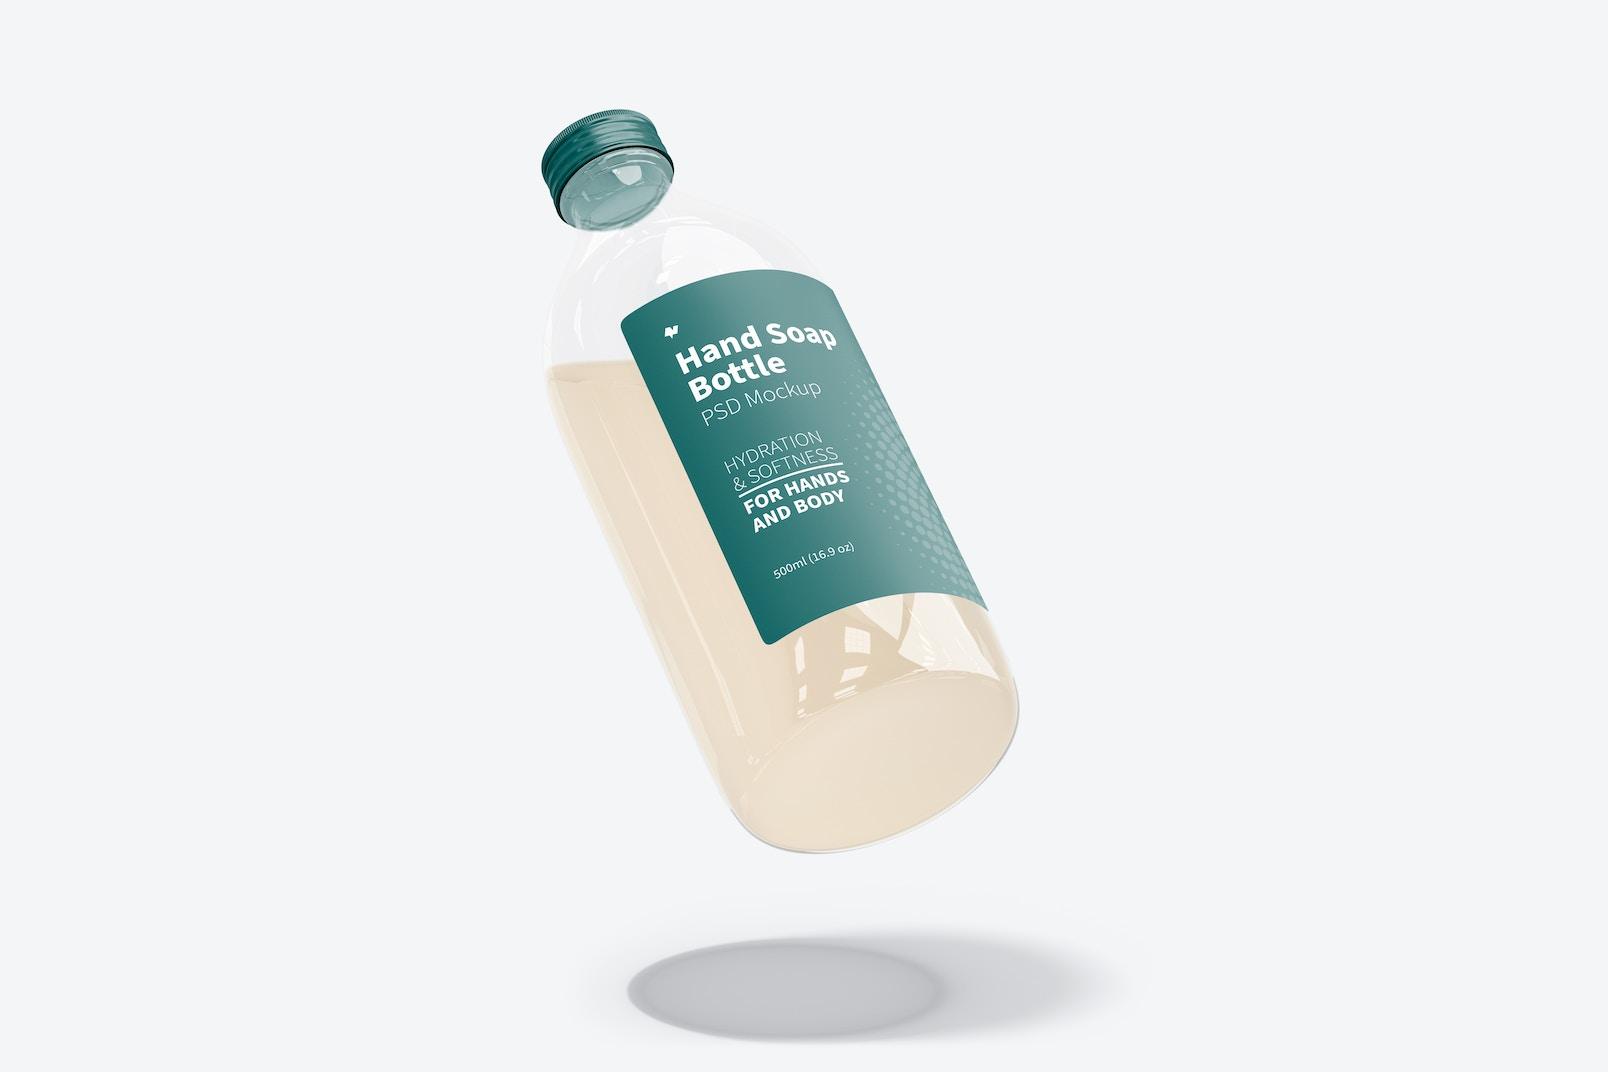 Hand Soap Clear Bottle Mockup, Floating